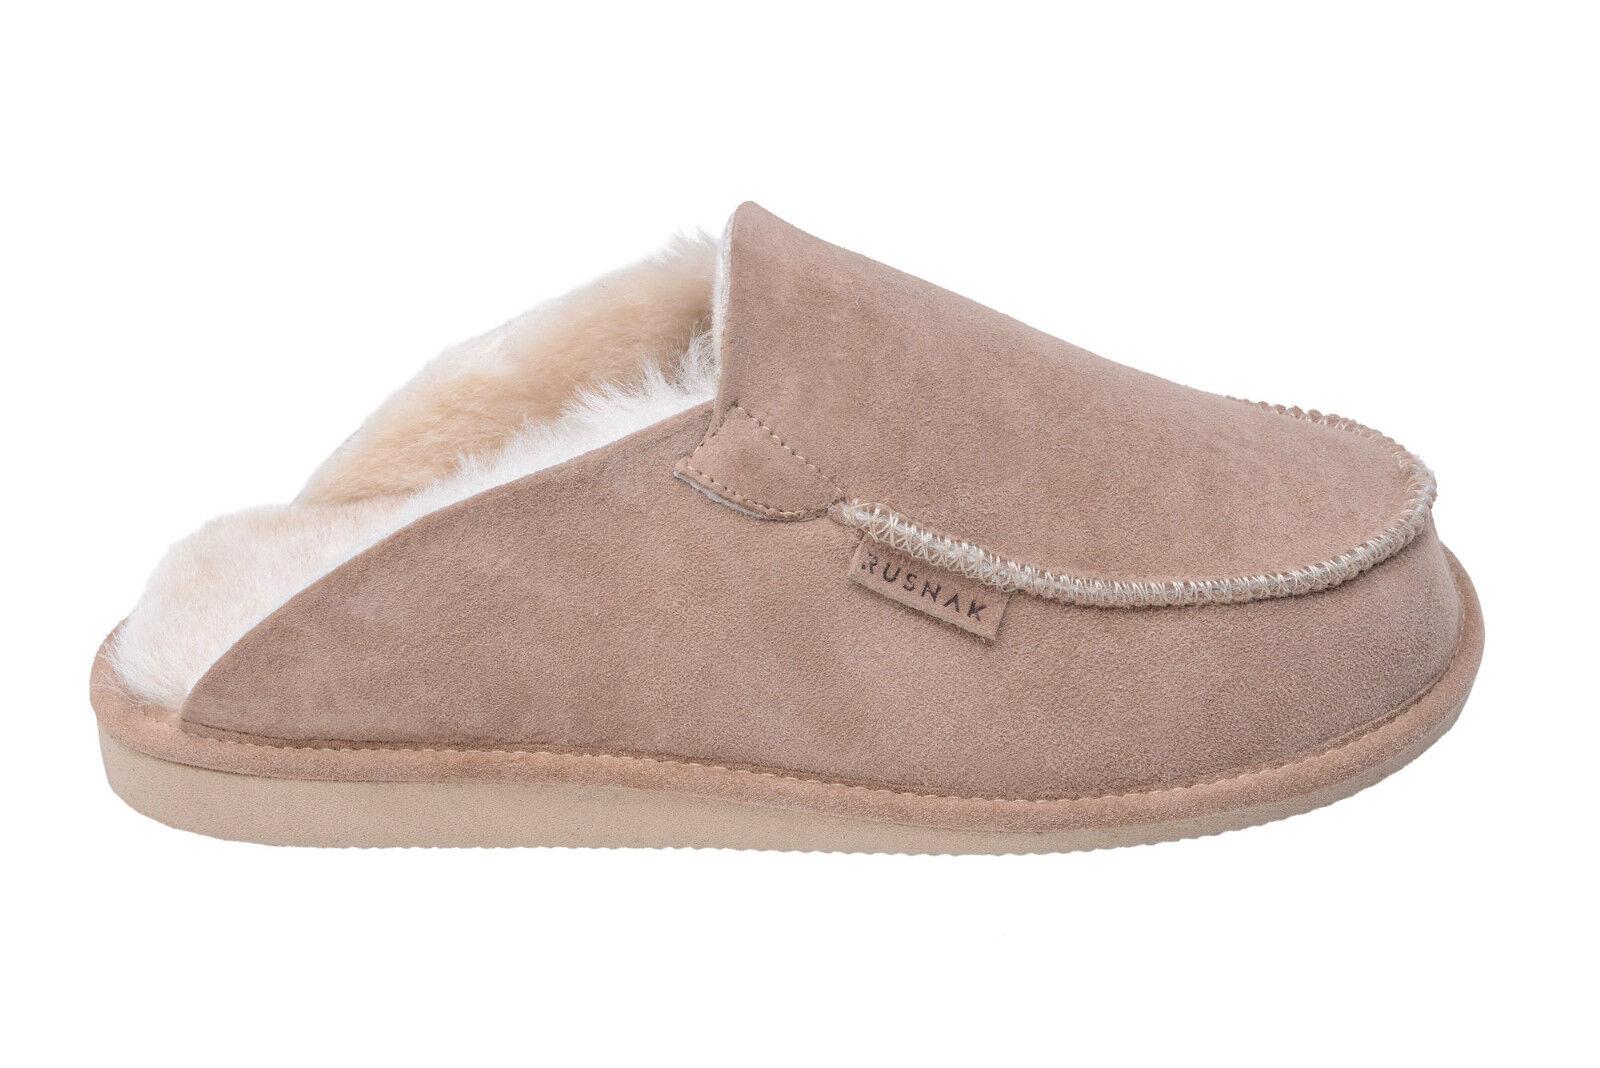 Mens Womens Genuine Sheepskin Suede Mule Slippers With